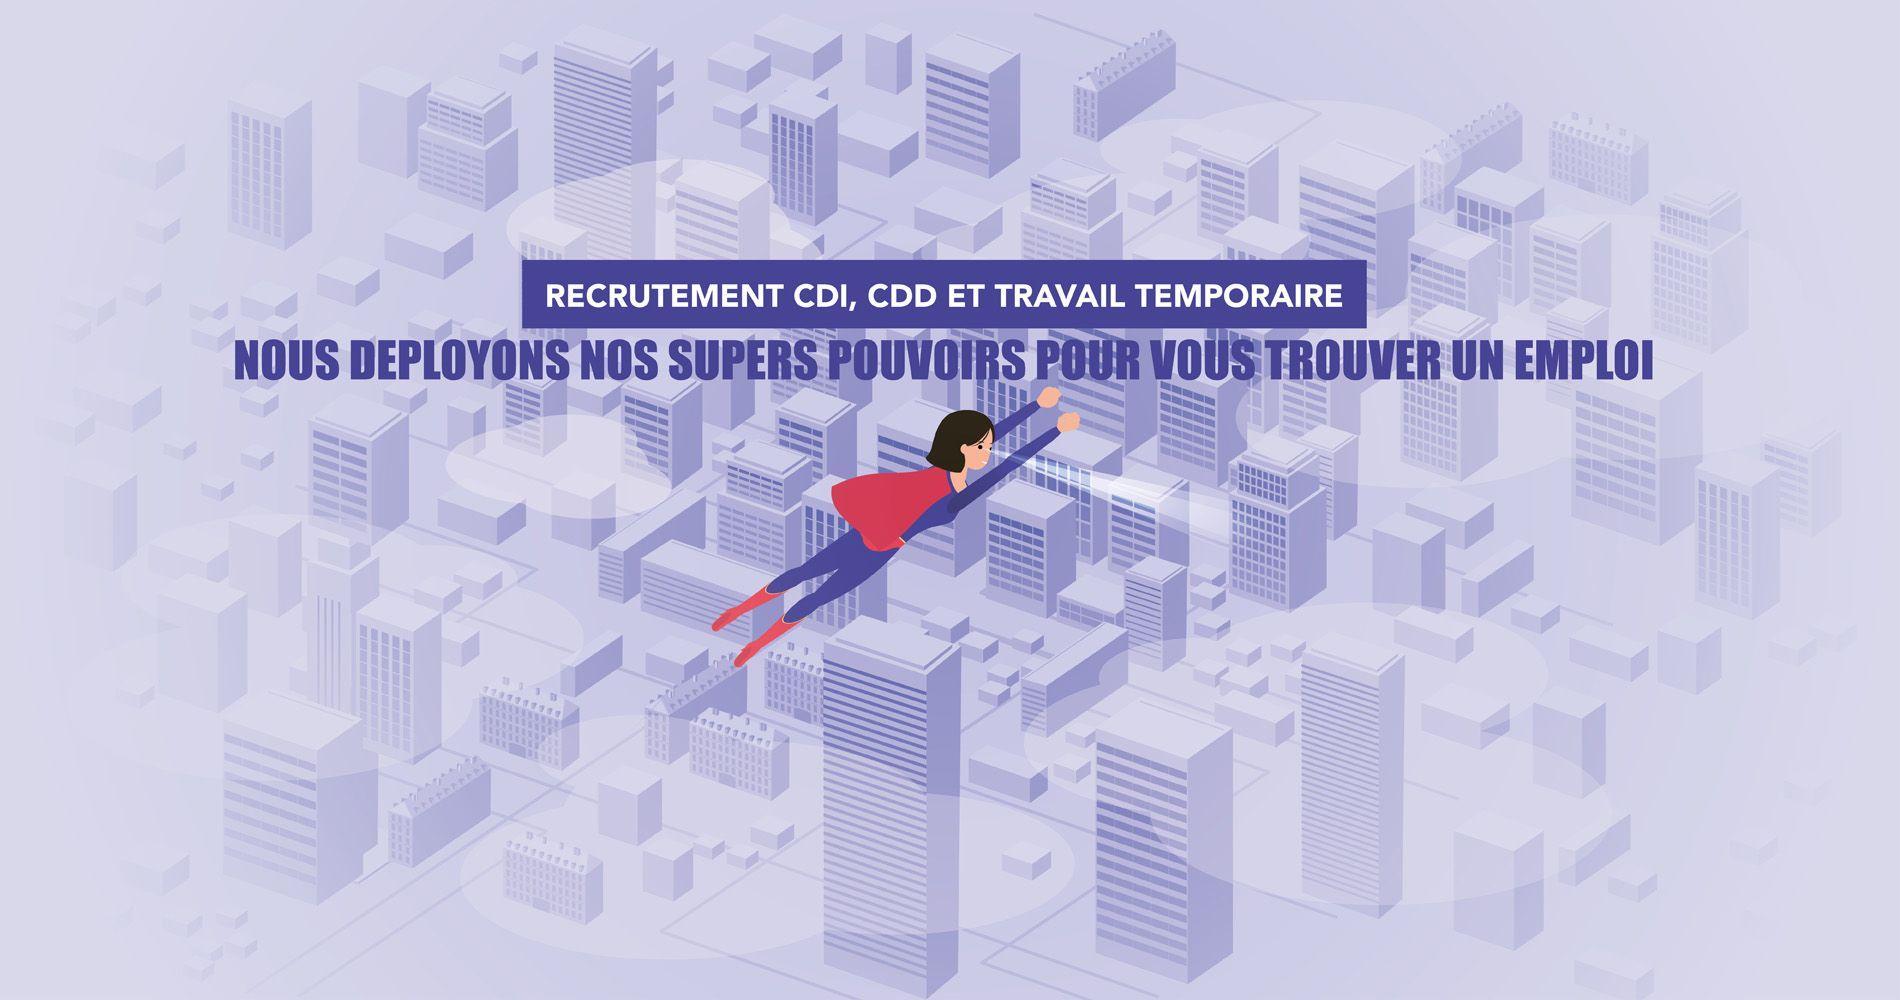 Bureau D Étude Béton Marseille emploi acass - marseille (13) recrutement - meteojob